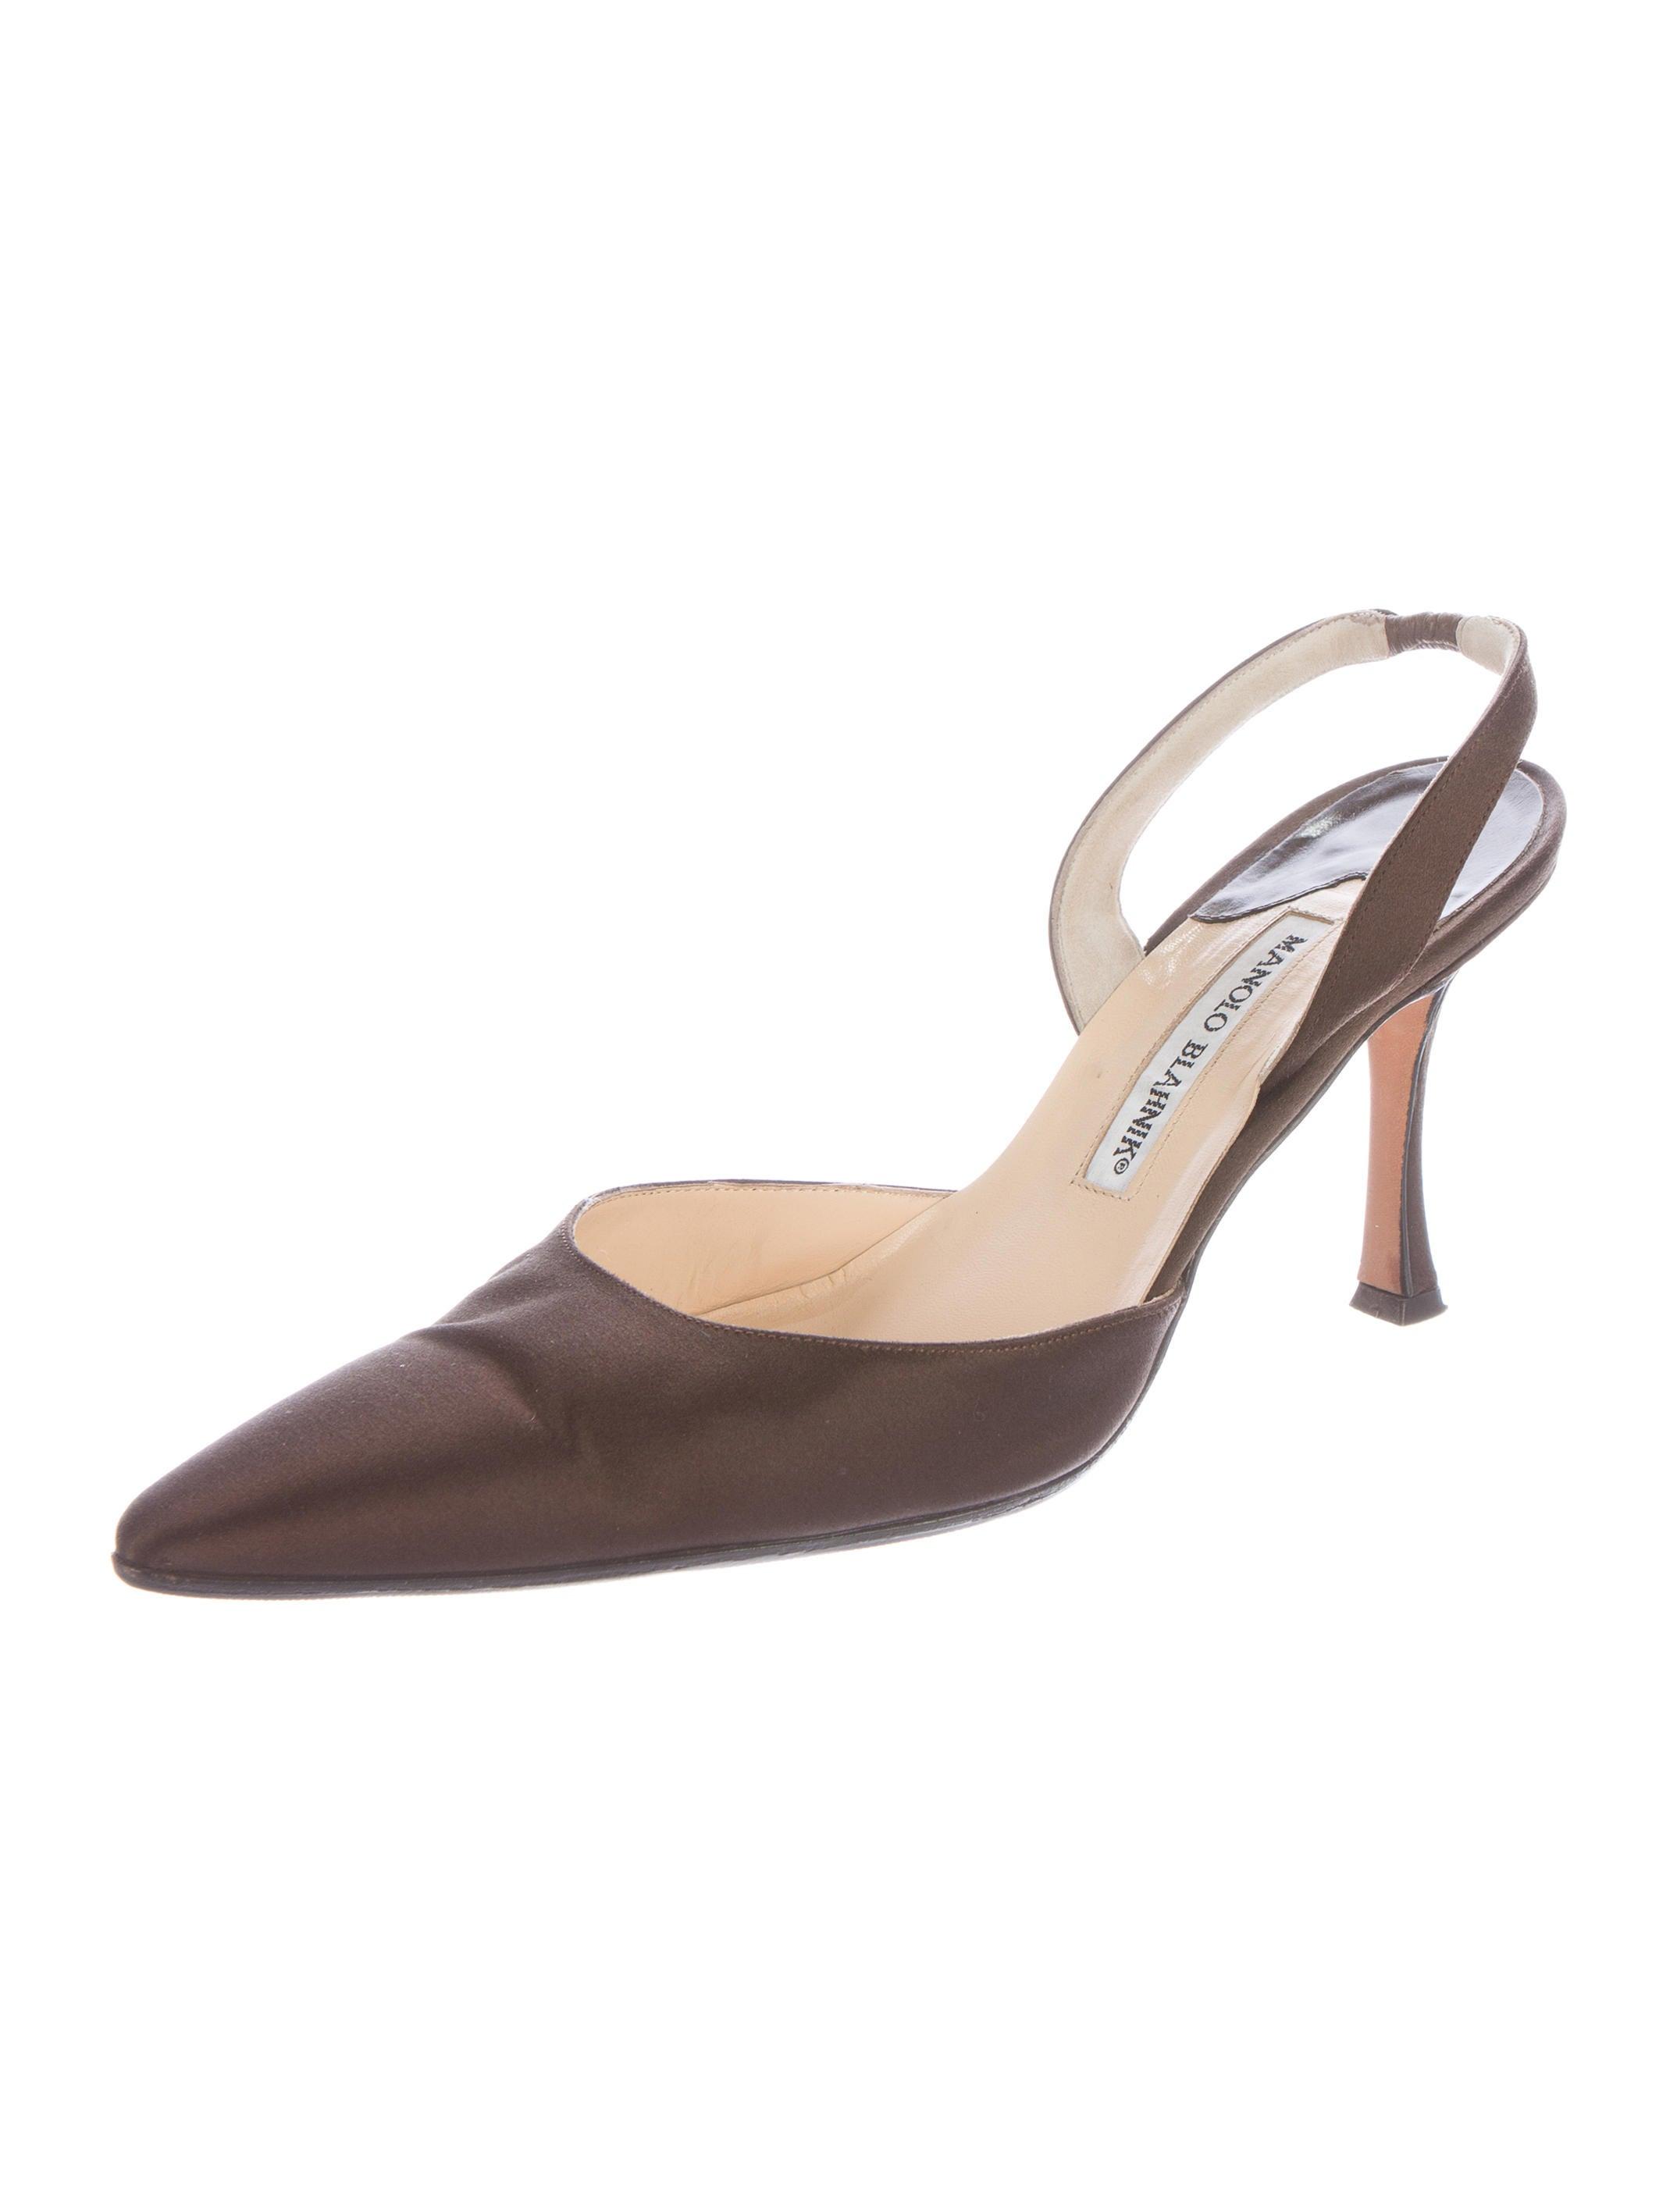 Manolo blahnik satin carolyne pumps shoes moo58568 for Shoe designer manolo blahnik